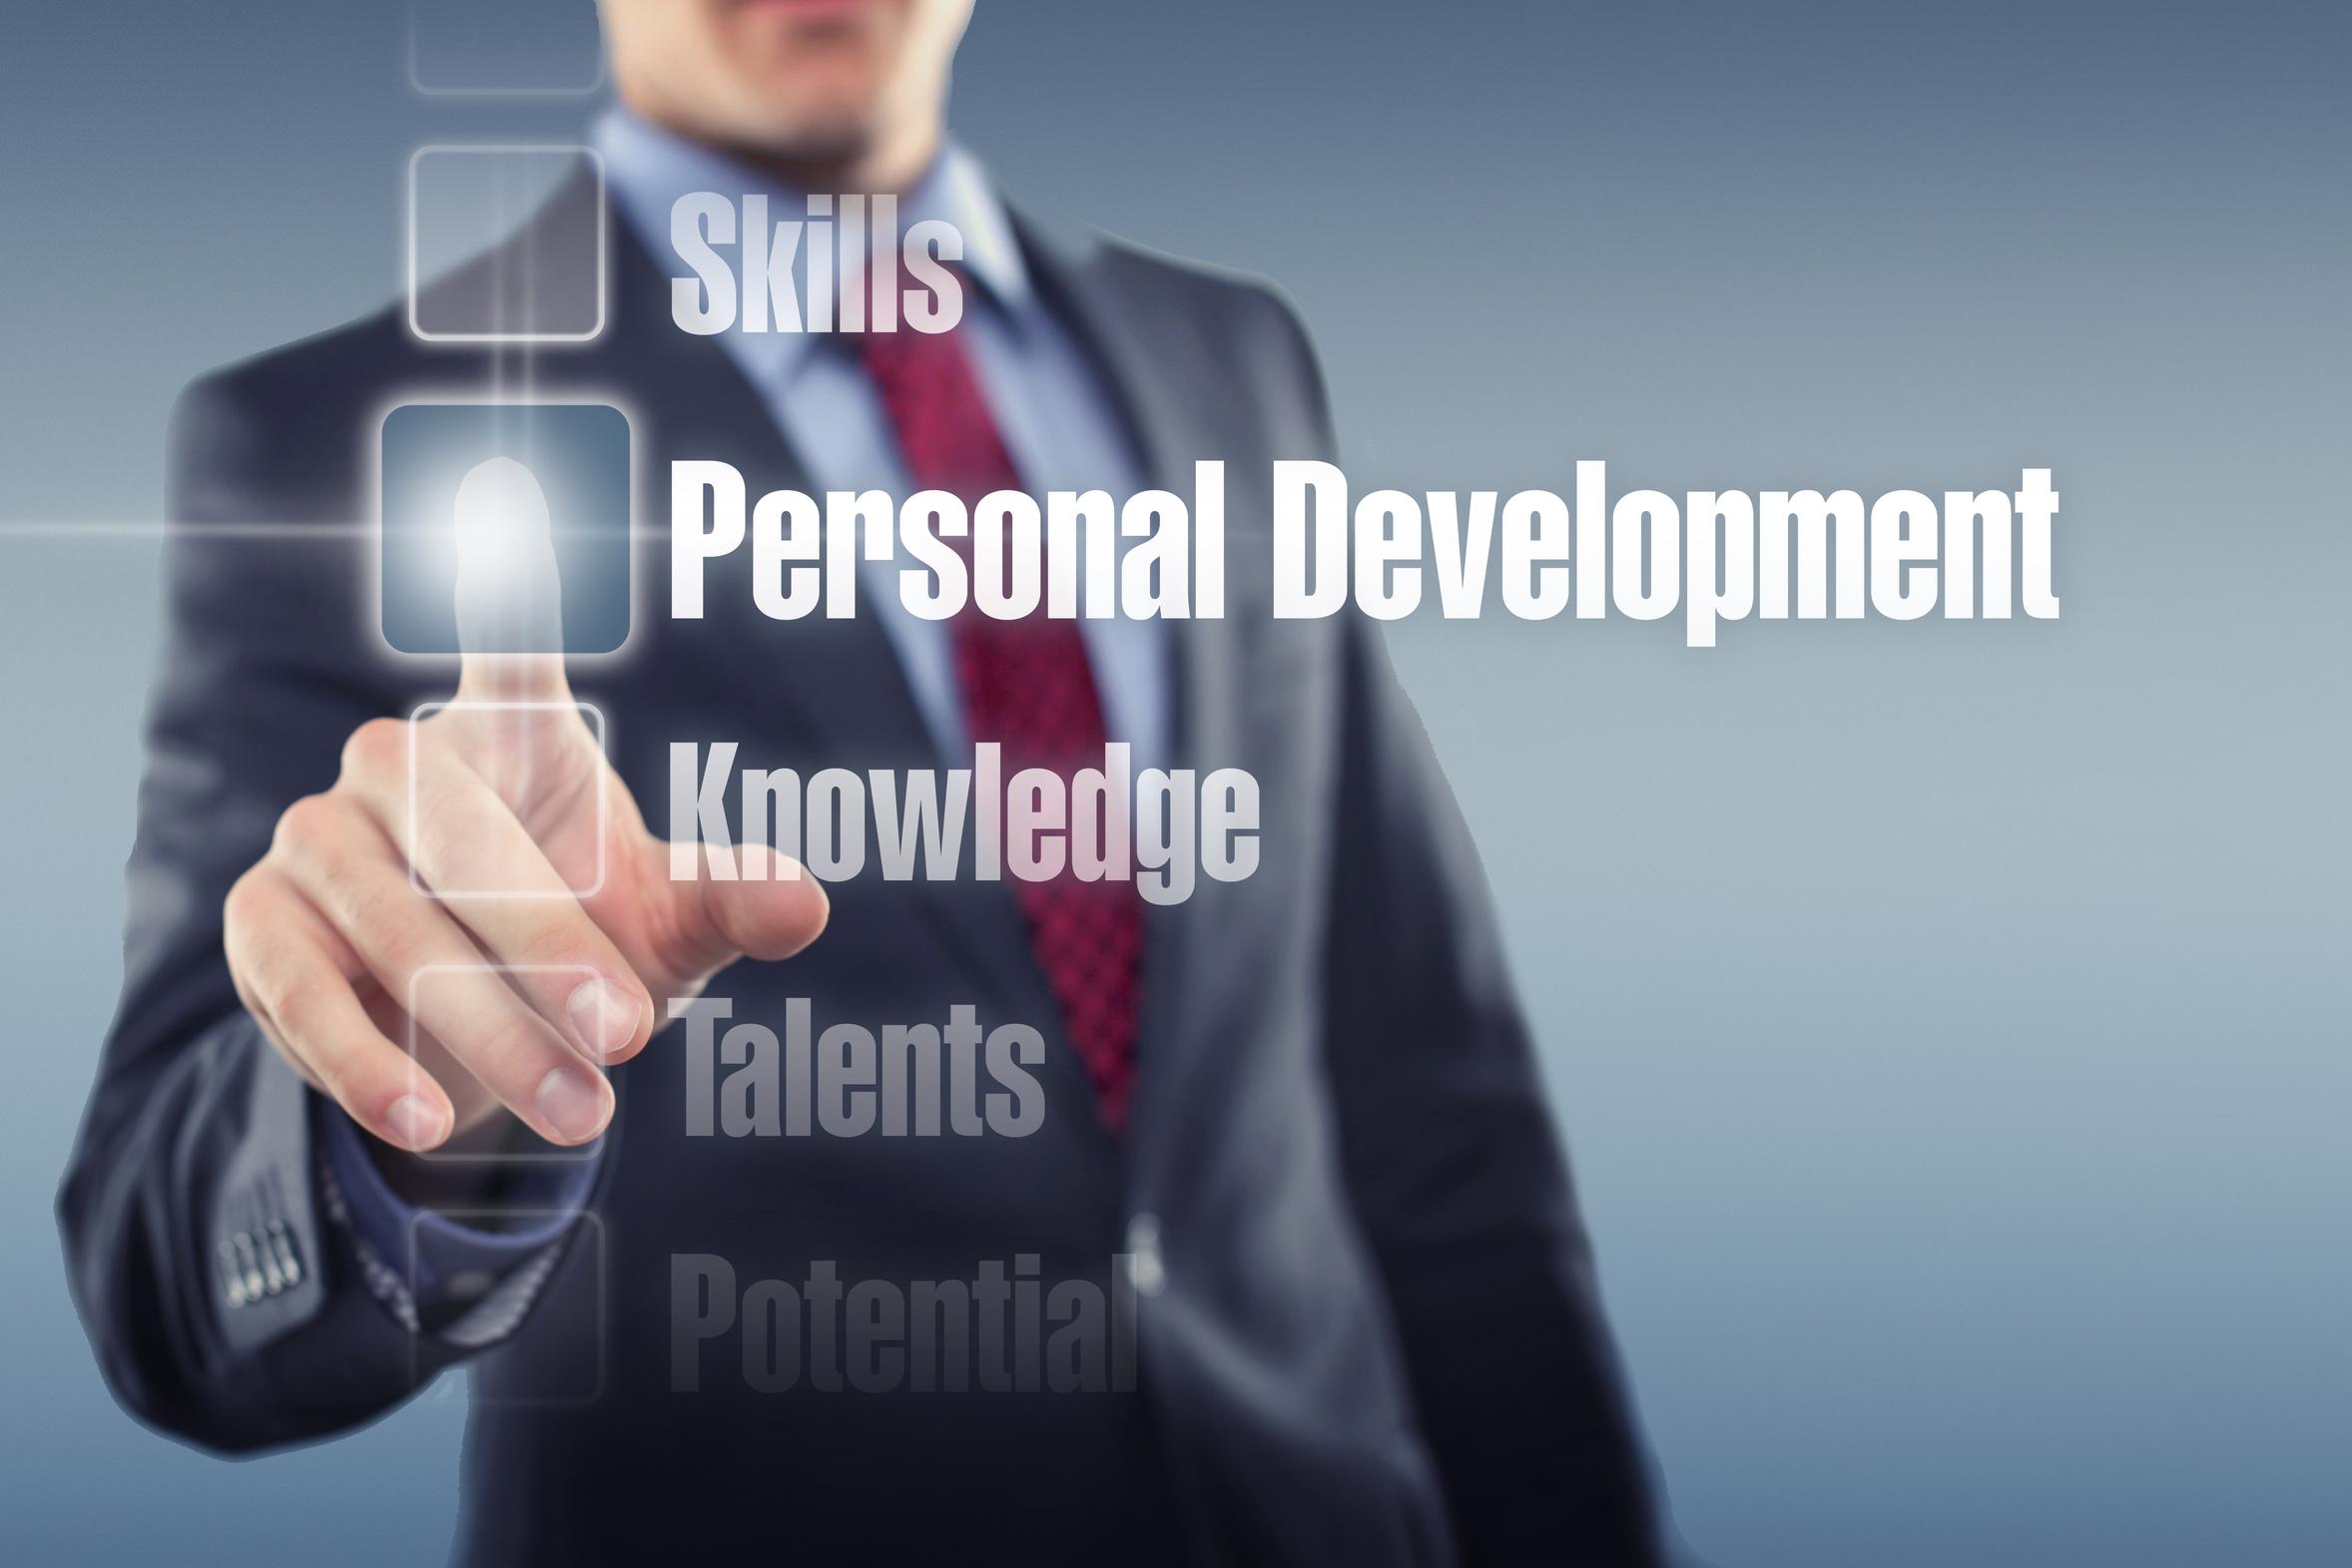 personal development skills training.jpg